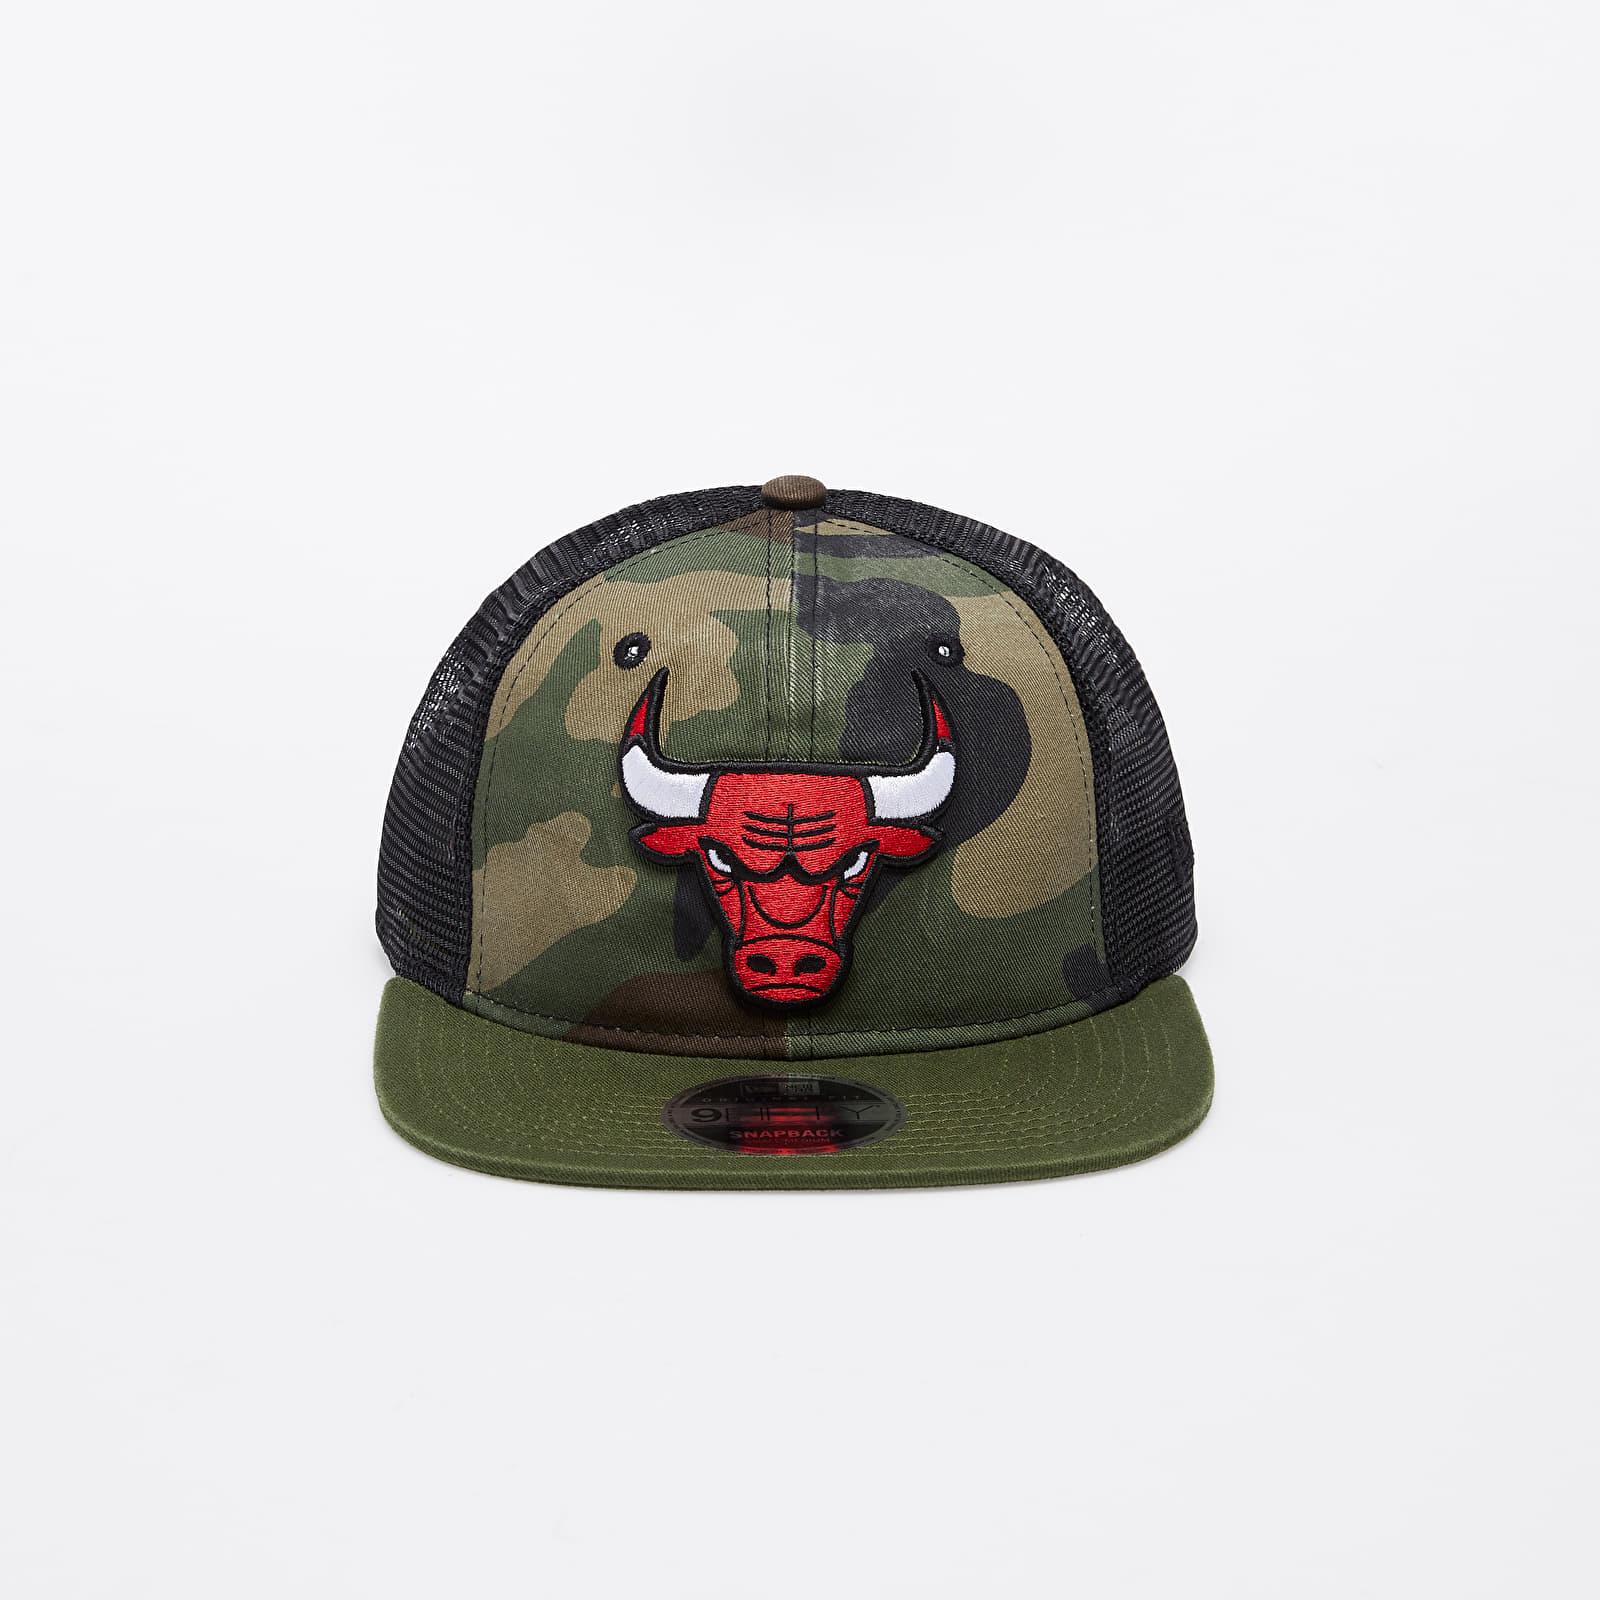 New Era 9Fifty NBA Chicago Bulls Trucker